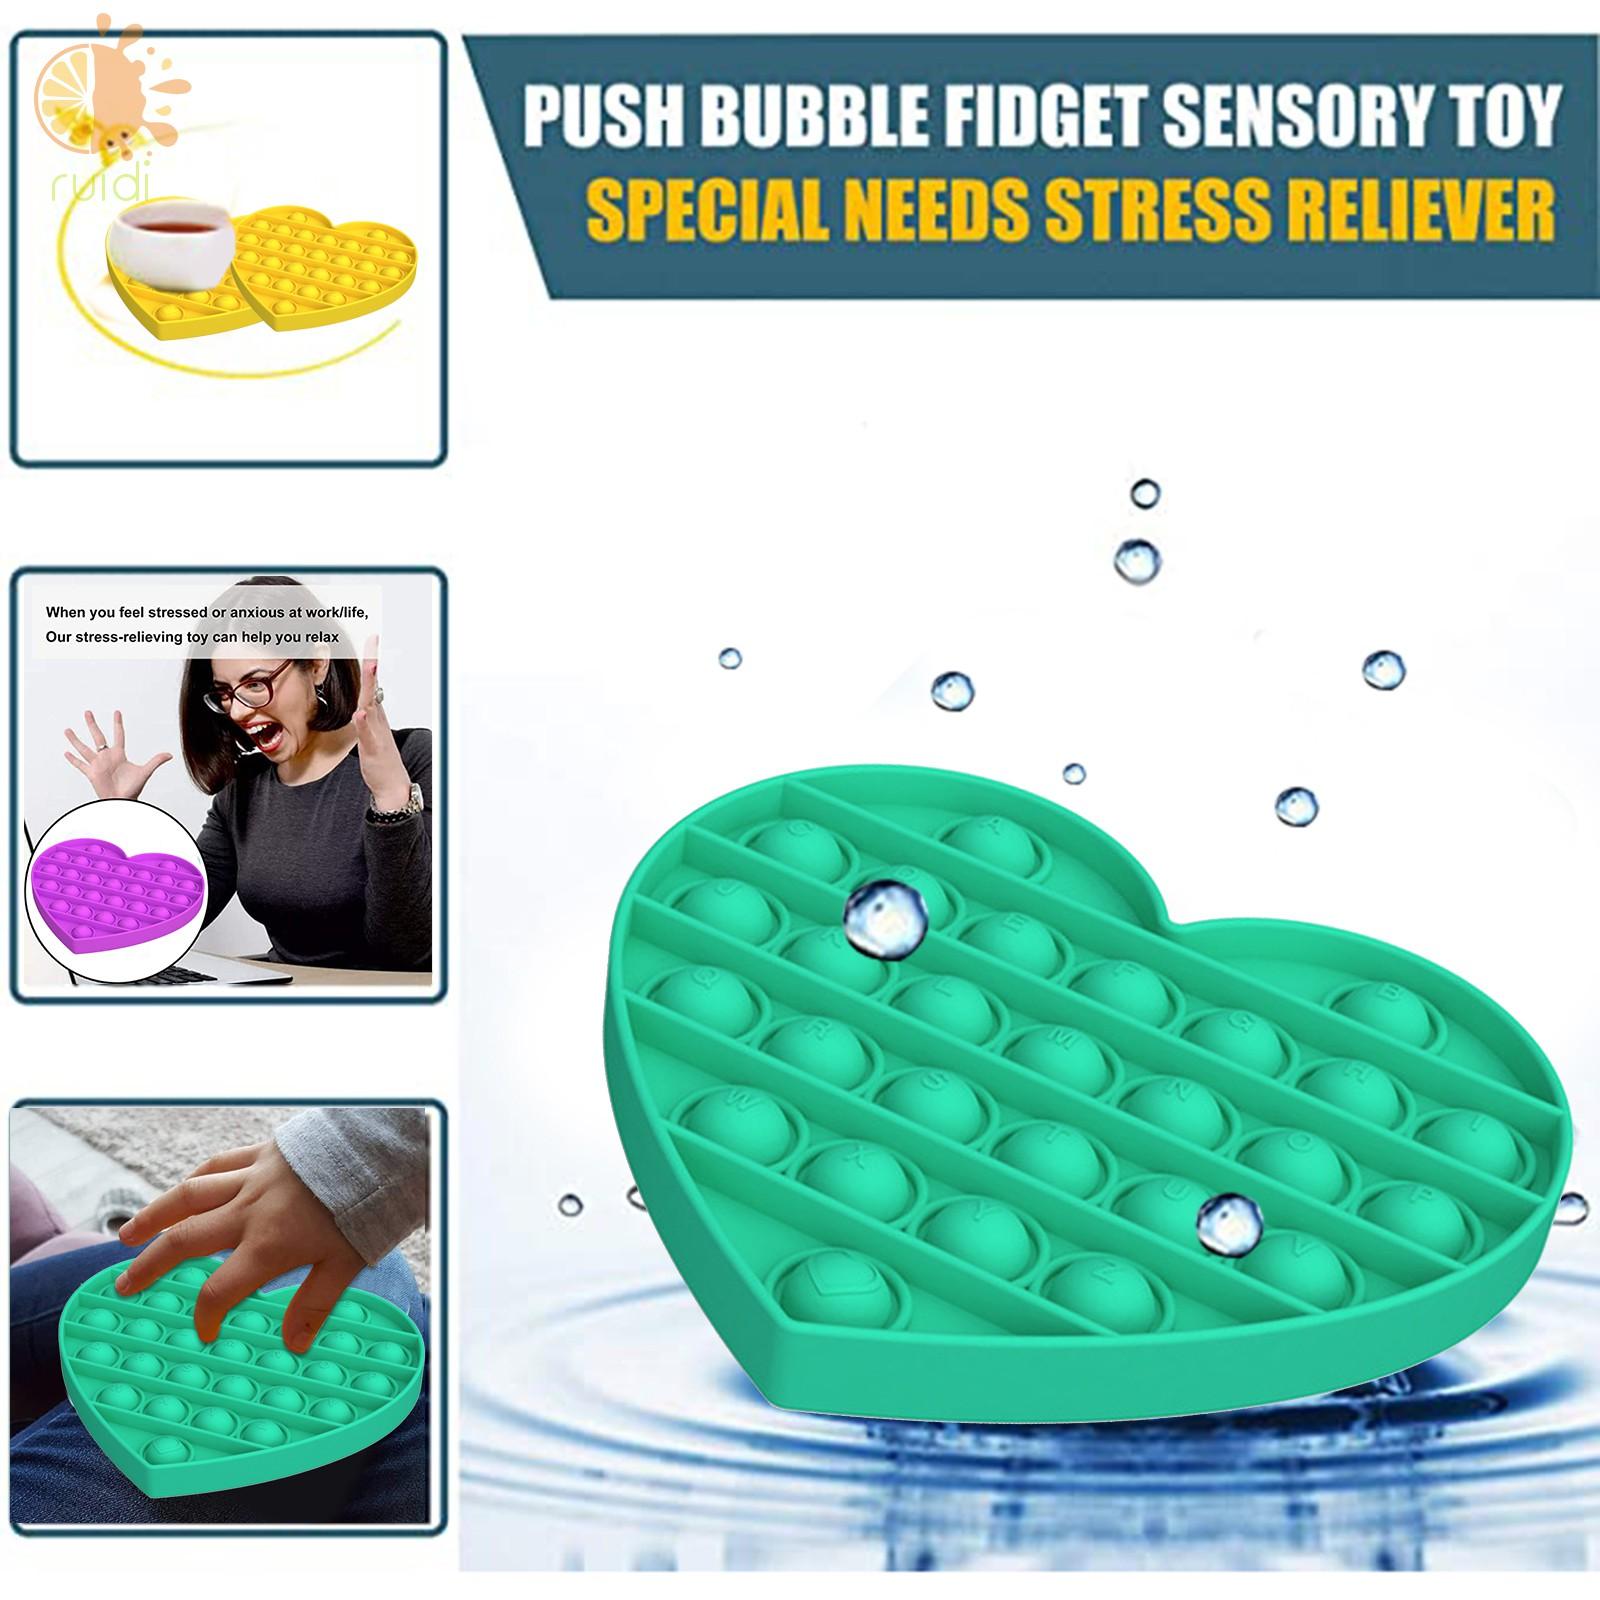 Push Pop Bubble Fidget Sensory Toy Stress Reliever Heat Shape Toy for Adult Kid